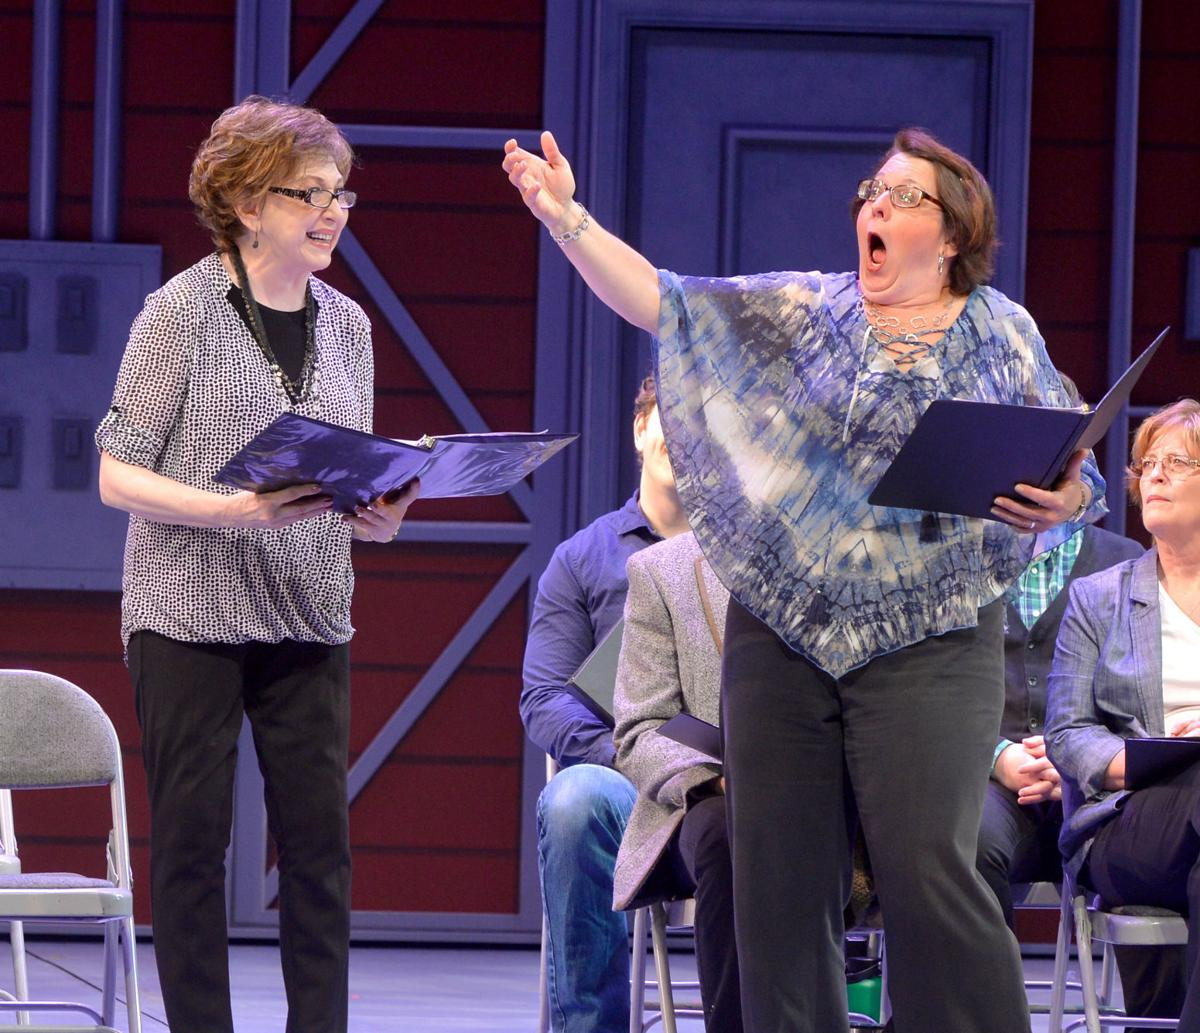 Barter Theater Schedule 2019 Barter Theatre presents its 2019 lineup | News | heraldcourier.com